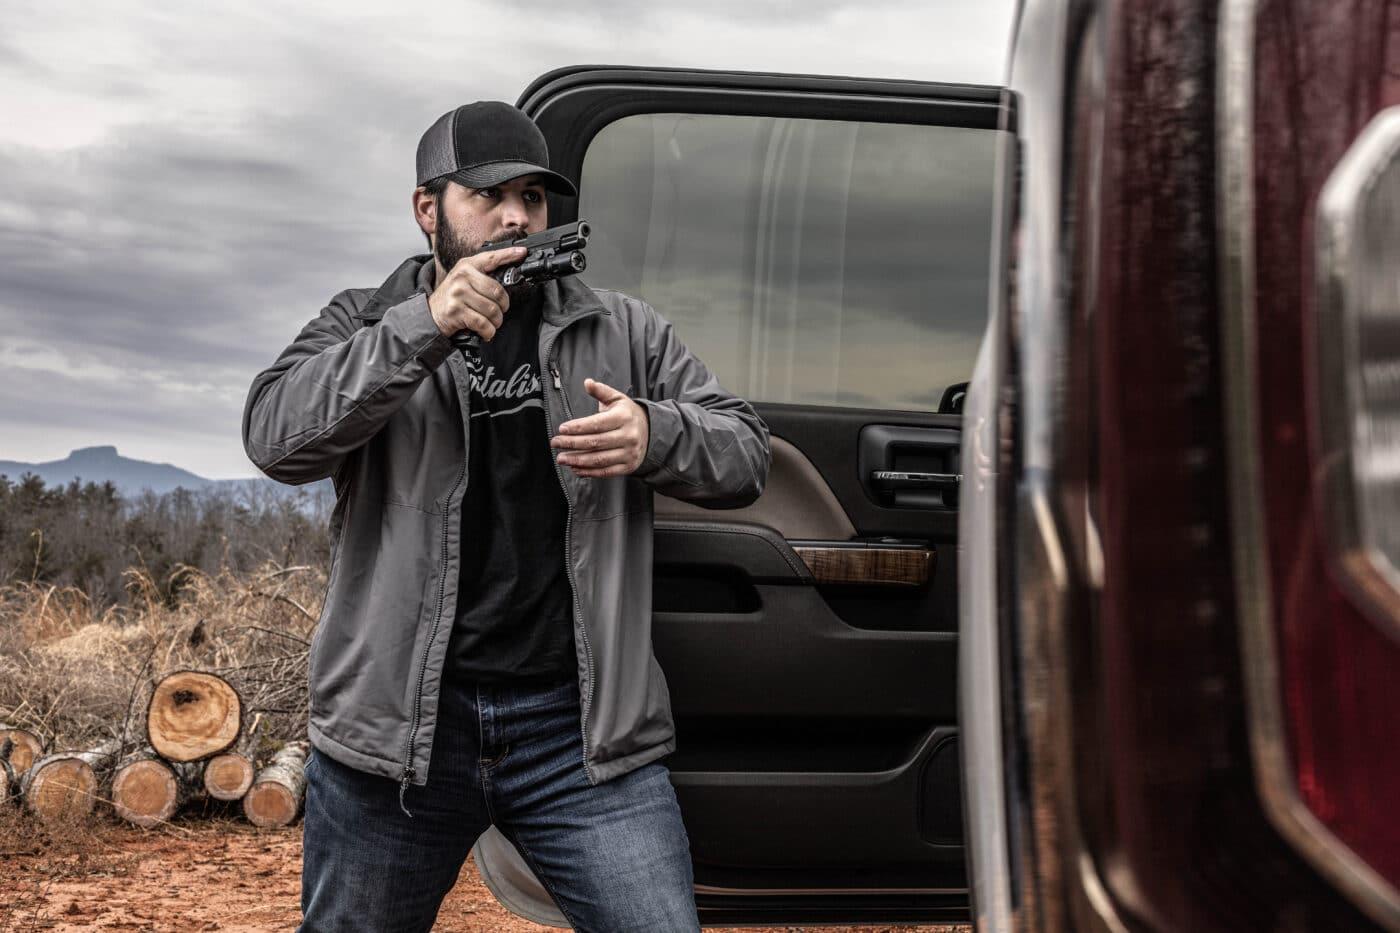 Man using Springfield Armory Professional Light Rail 9mm pistol as an EDC weapon